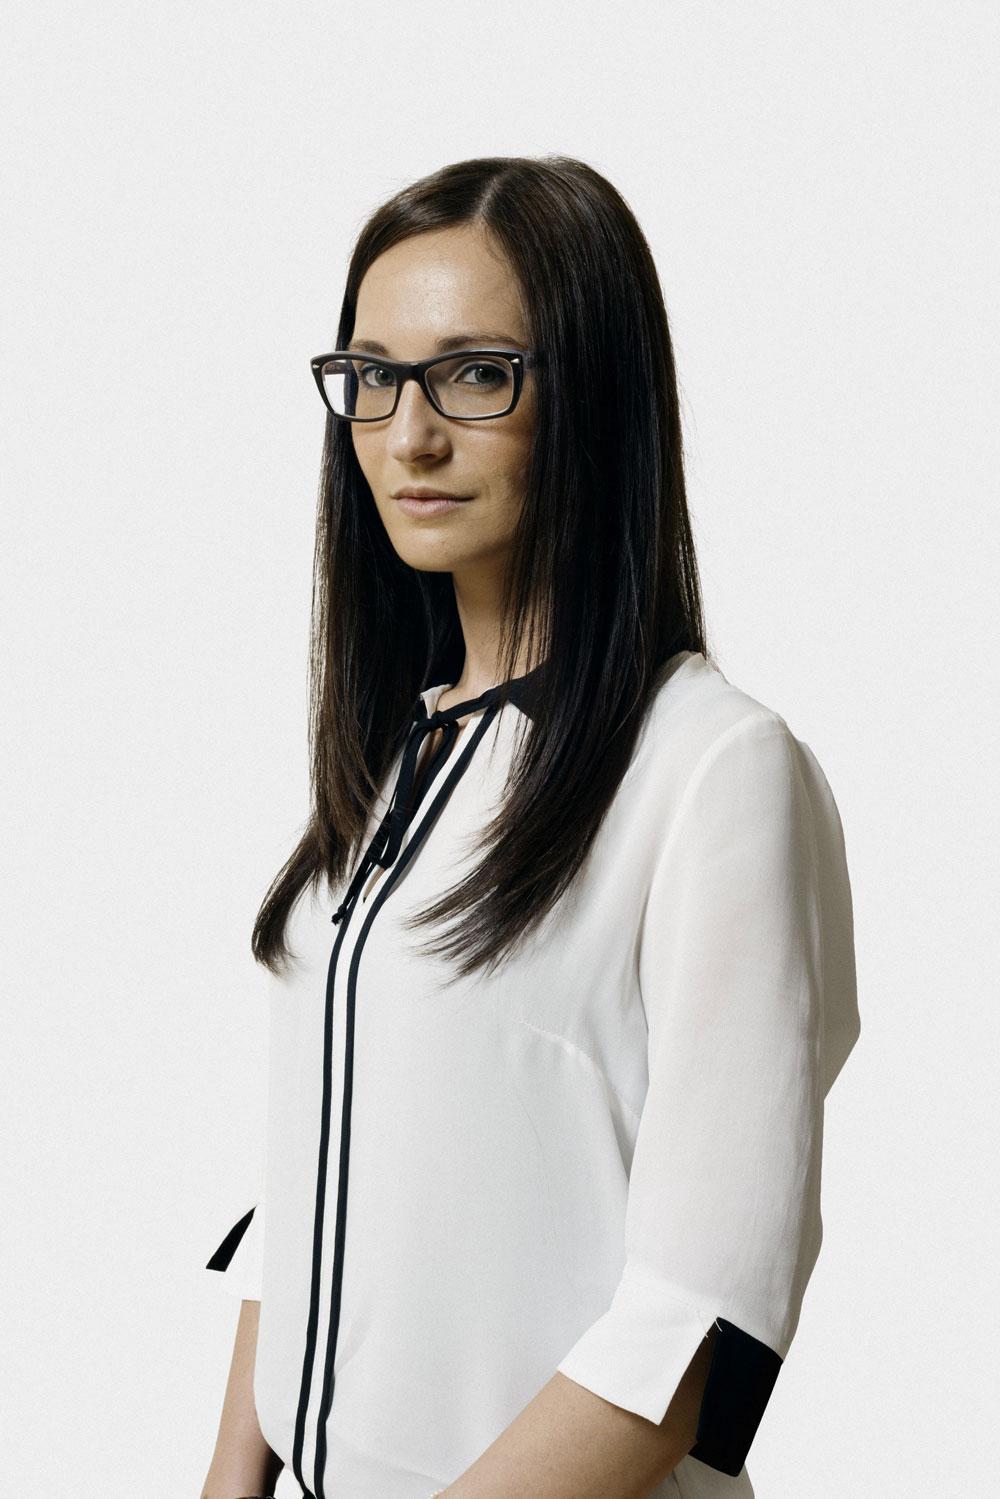 Michela Garbin